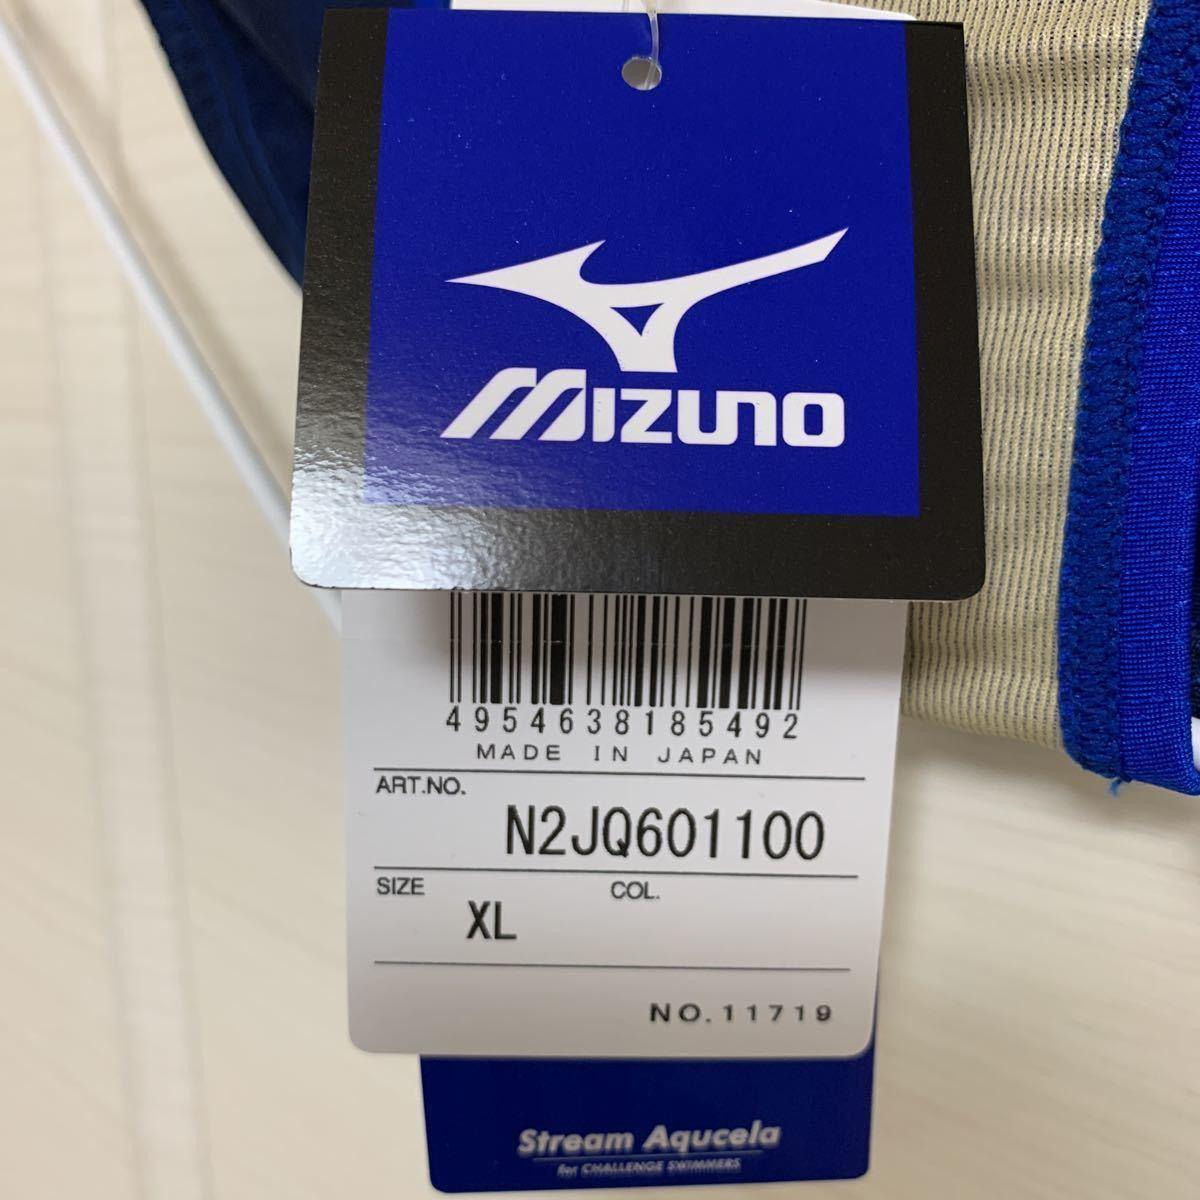 MIZUNO(ミズノ)新品(別注) XLサイズ 旧ロゴ 箱あり タグあり ストリームアクセラ 競パン Vパン ブルー/ネイビー N2JQ601100 ブーメラン_画像8